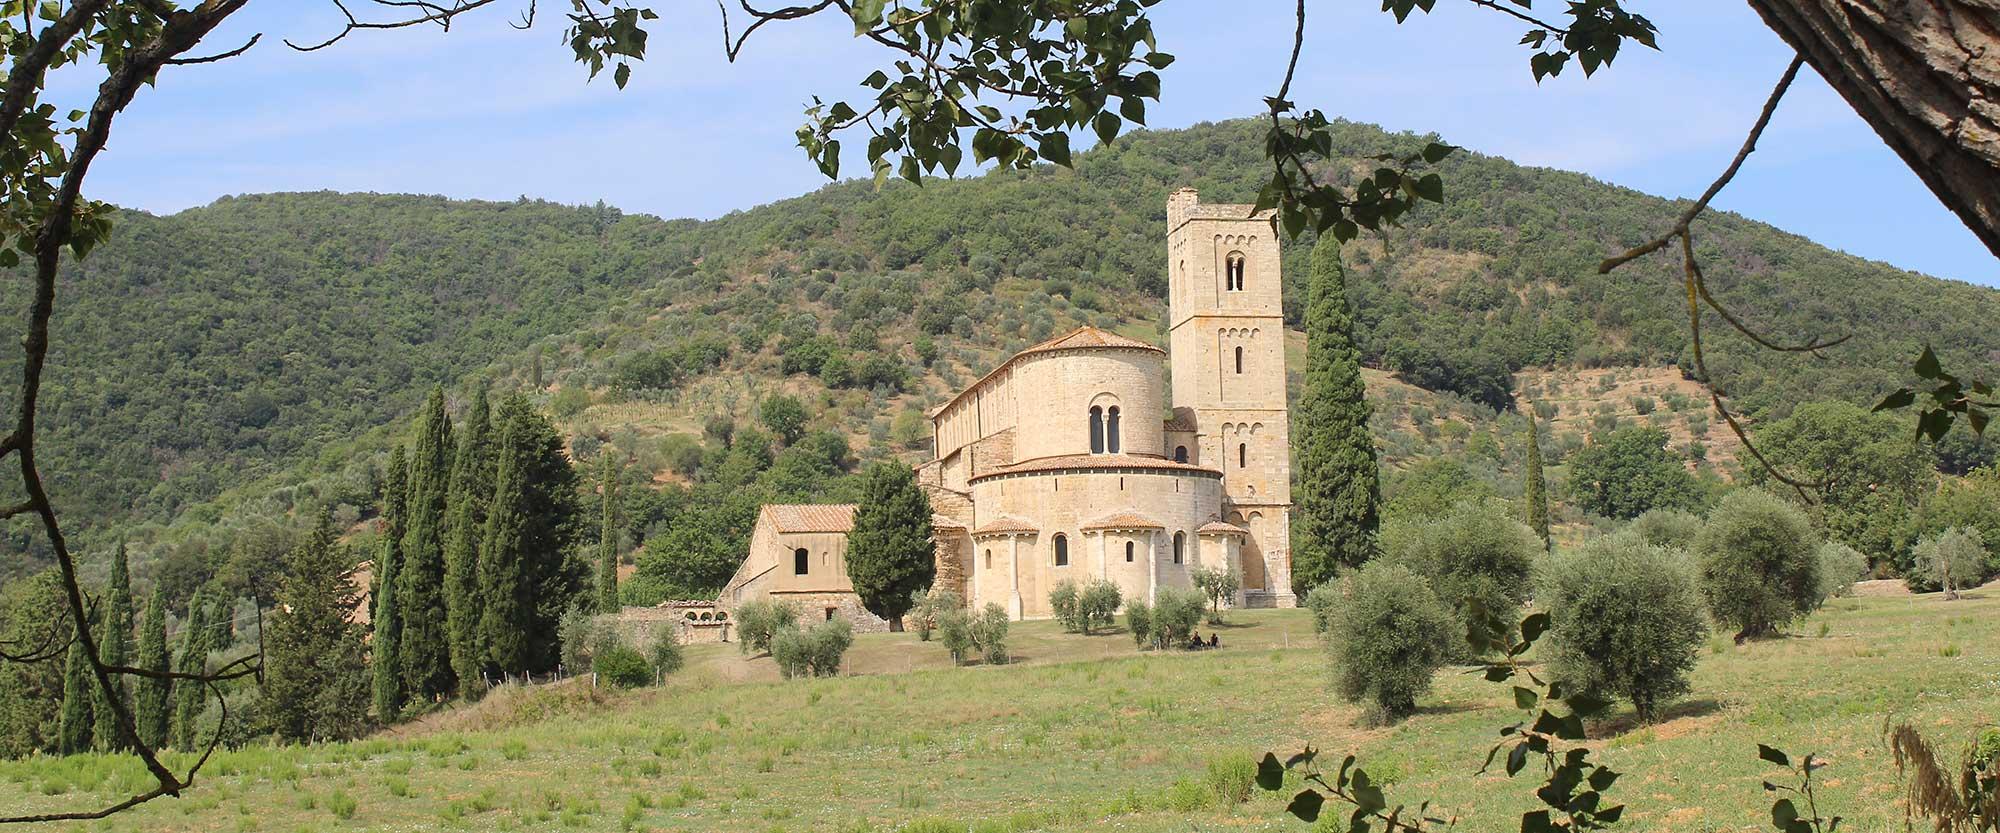 La Via Francigena da Siena a Bolsena